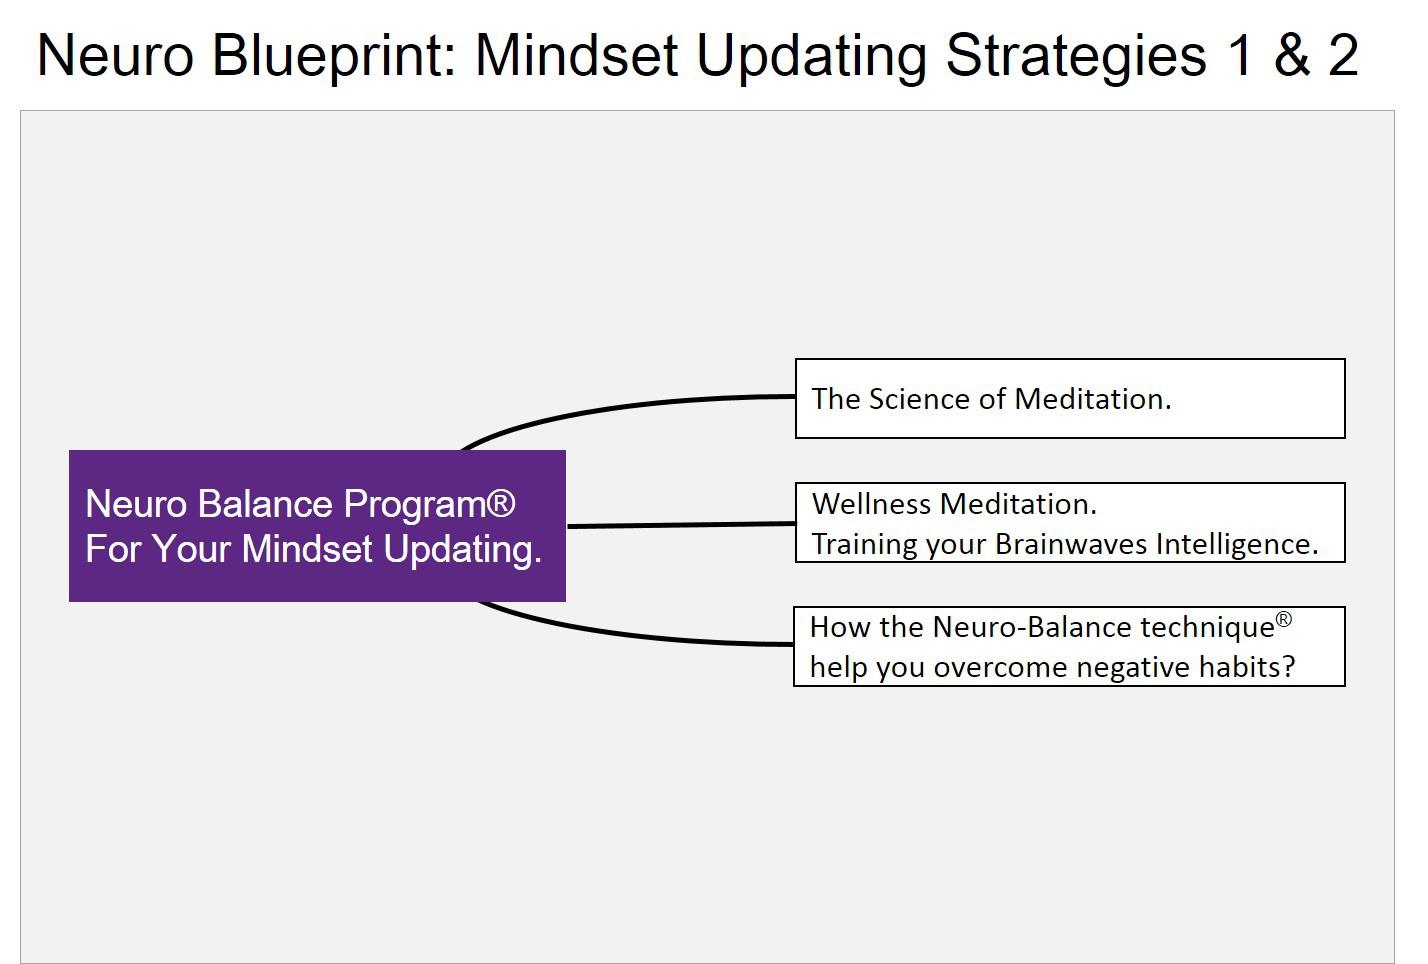 Inner work transform home neuro blueprint neuro mindset udating strategies 1 2 malvernweather Gallery